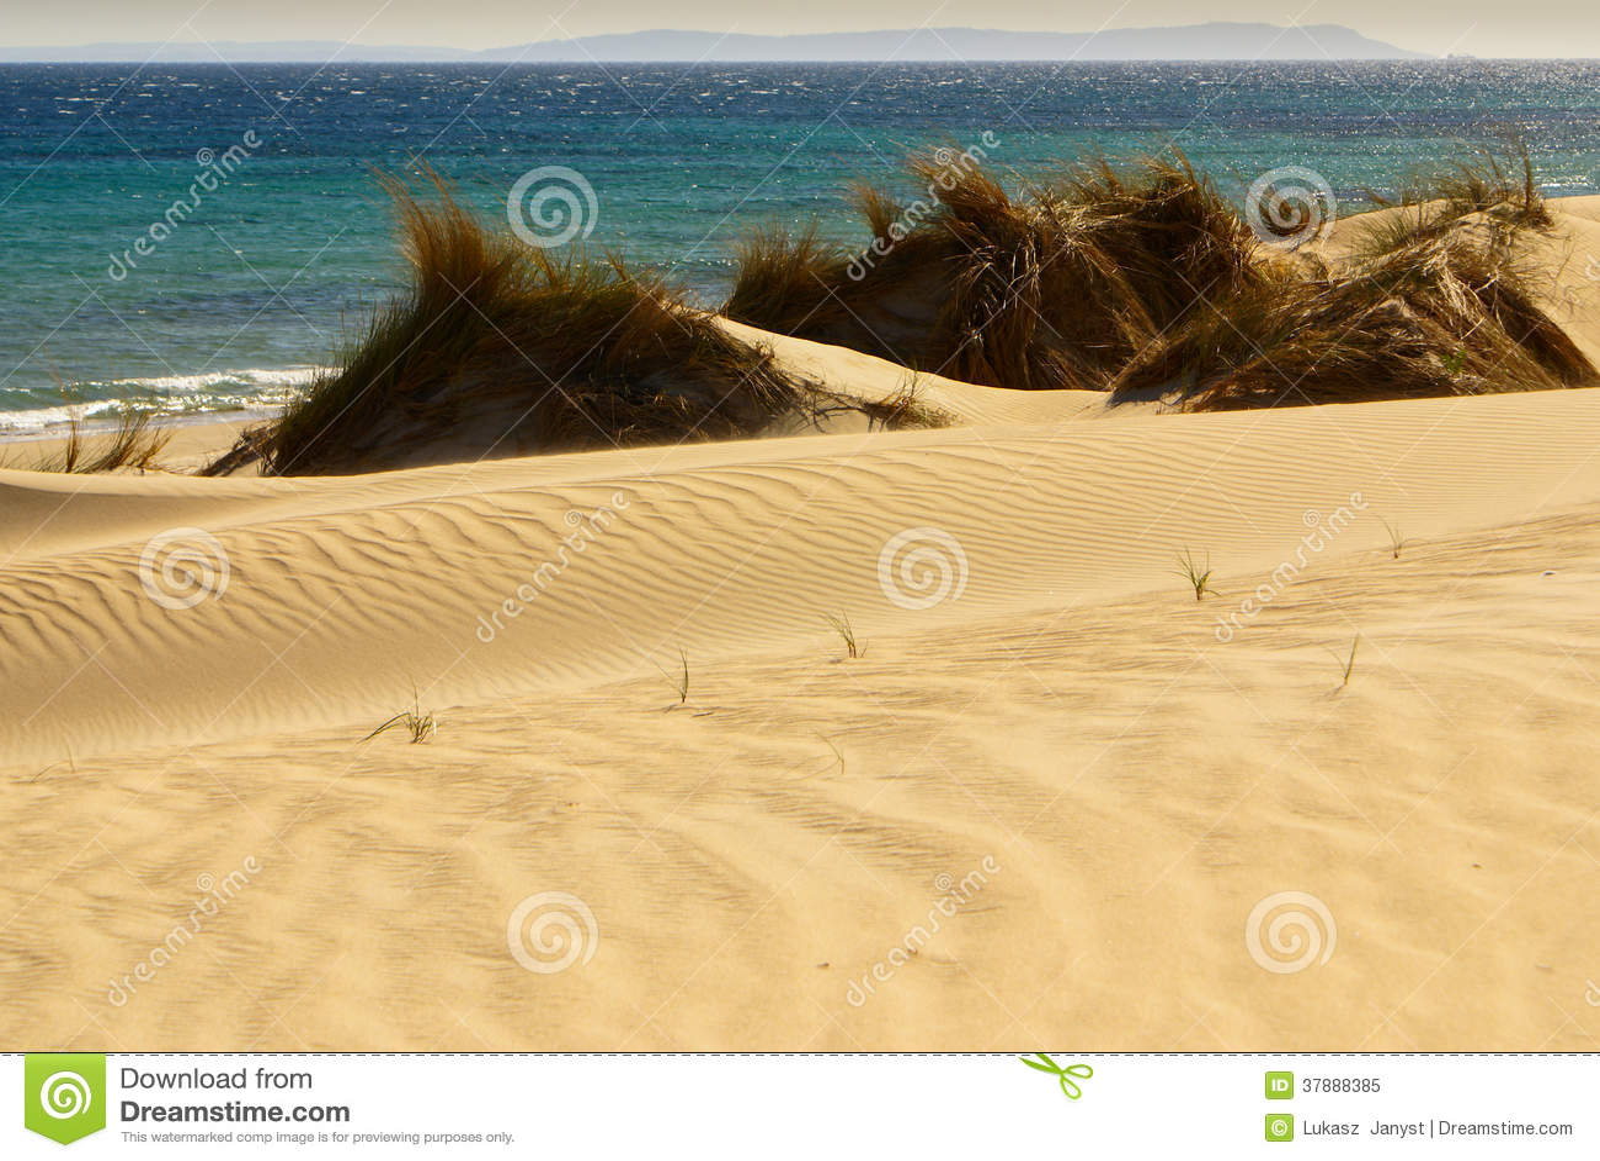 Mooie mening over strand en oceaan, Spanje, Tarifa